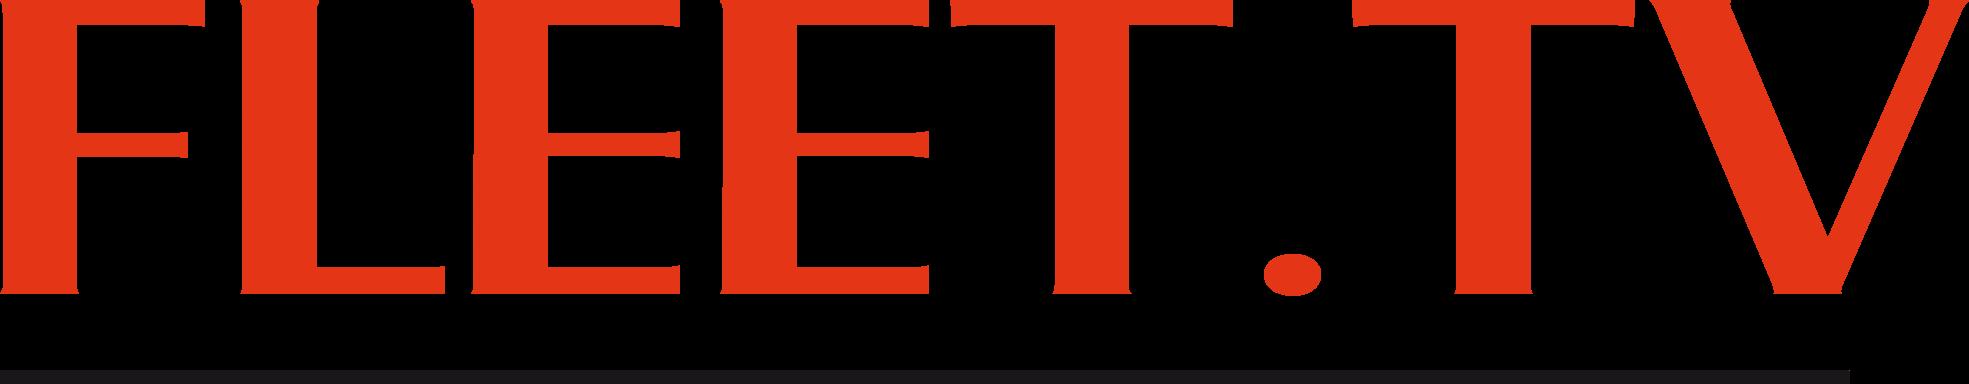 FLEET>TV